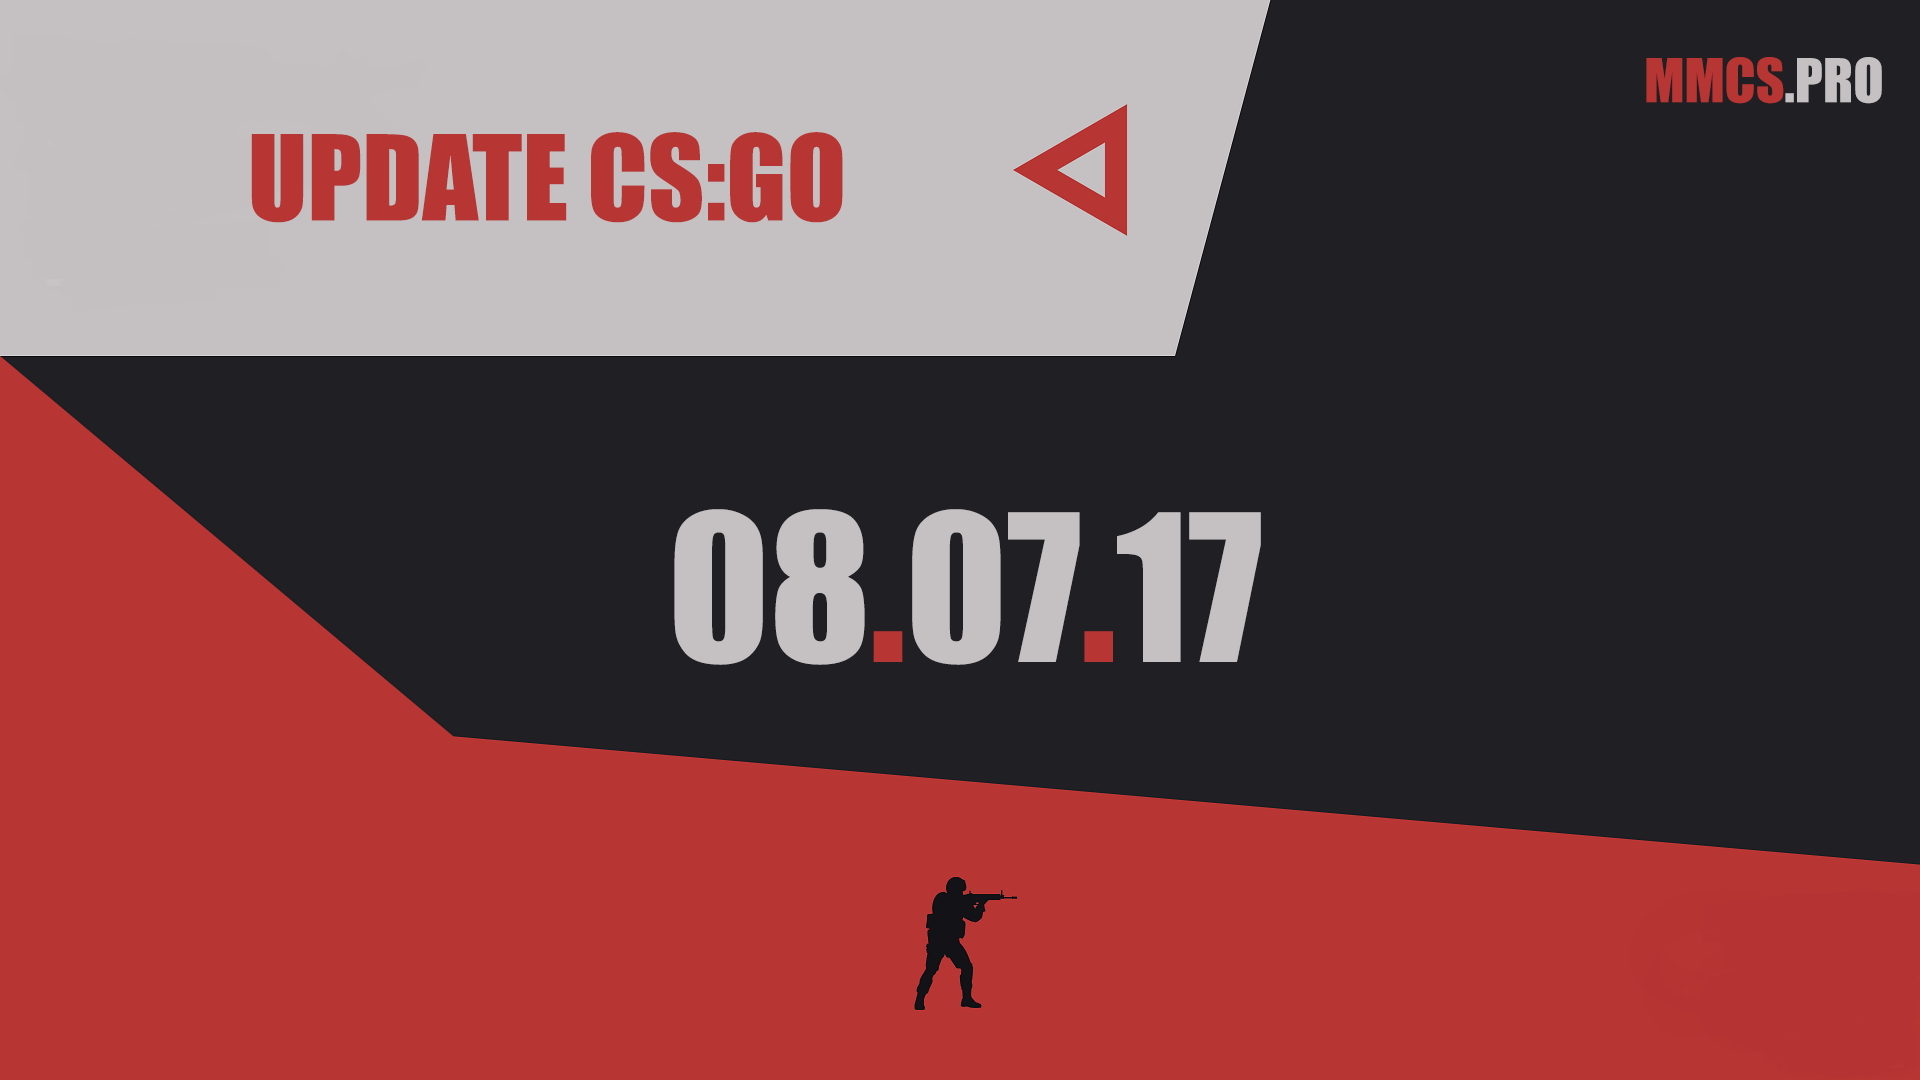 https://mmcs.pro/update-csgo-08-07-2017-valve/